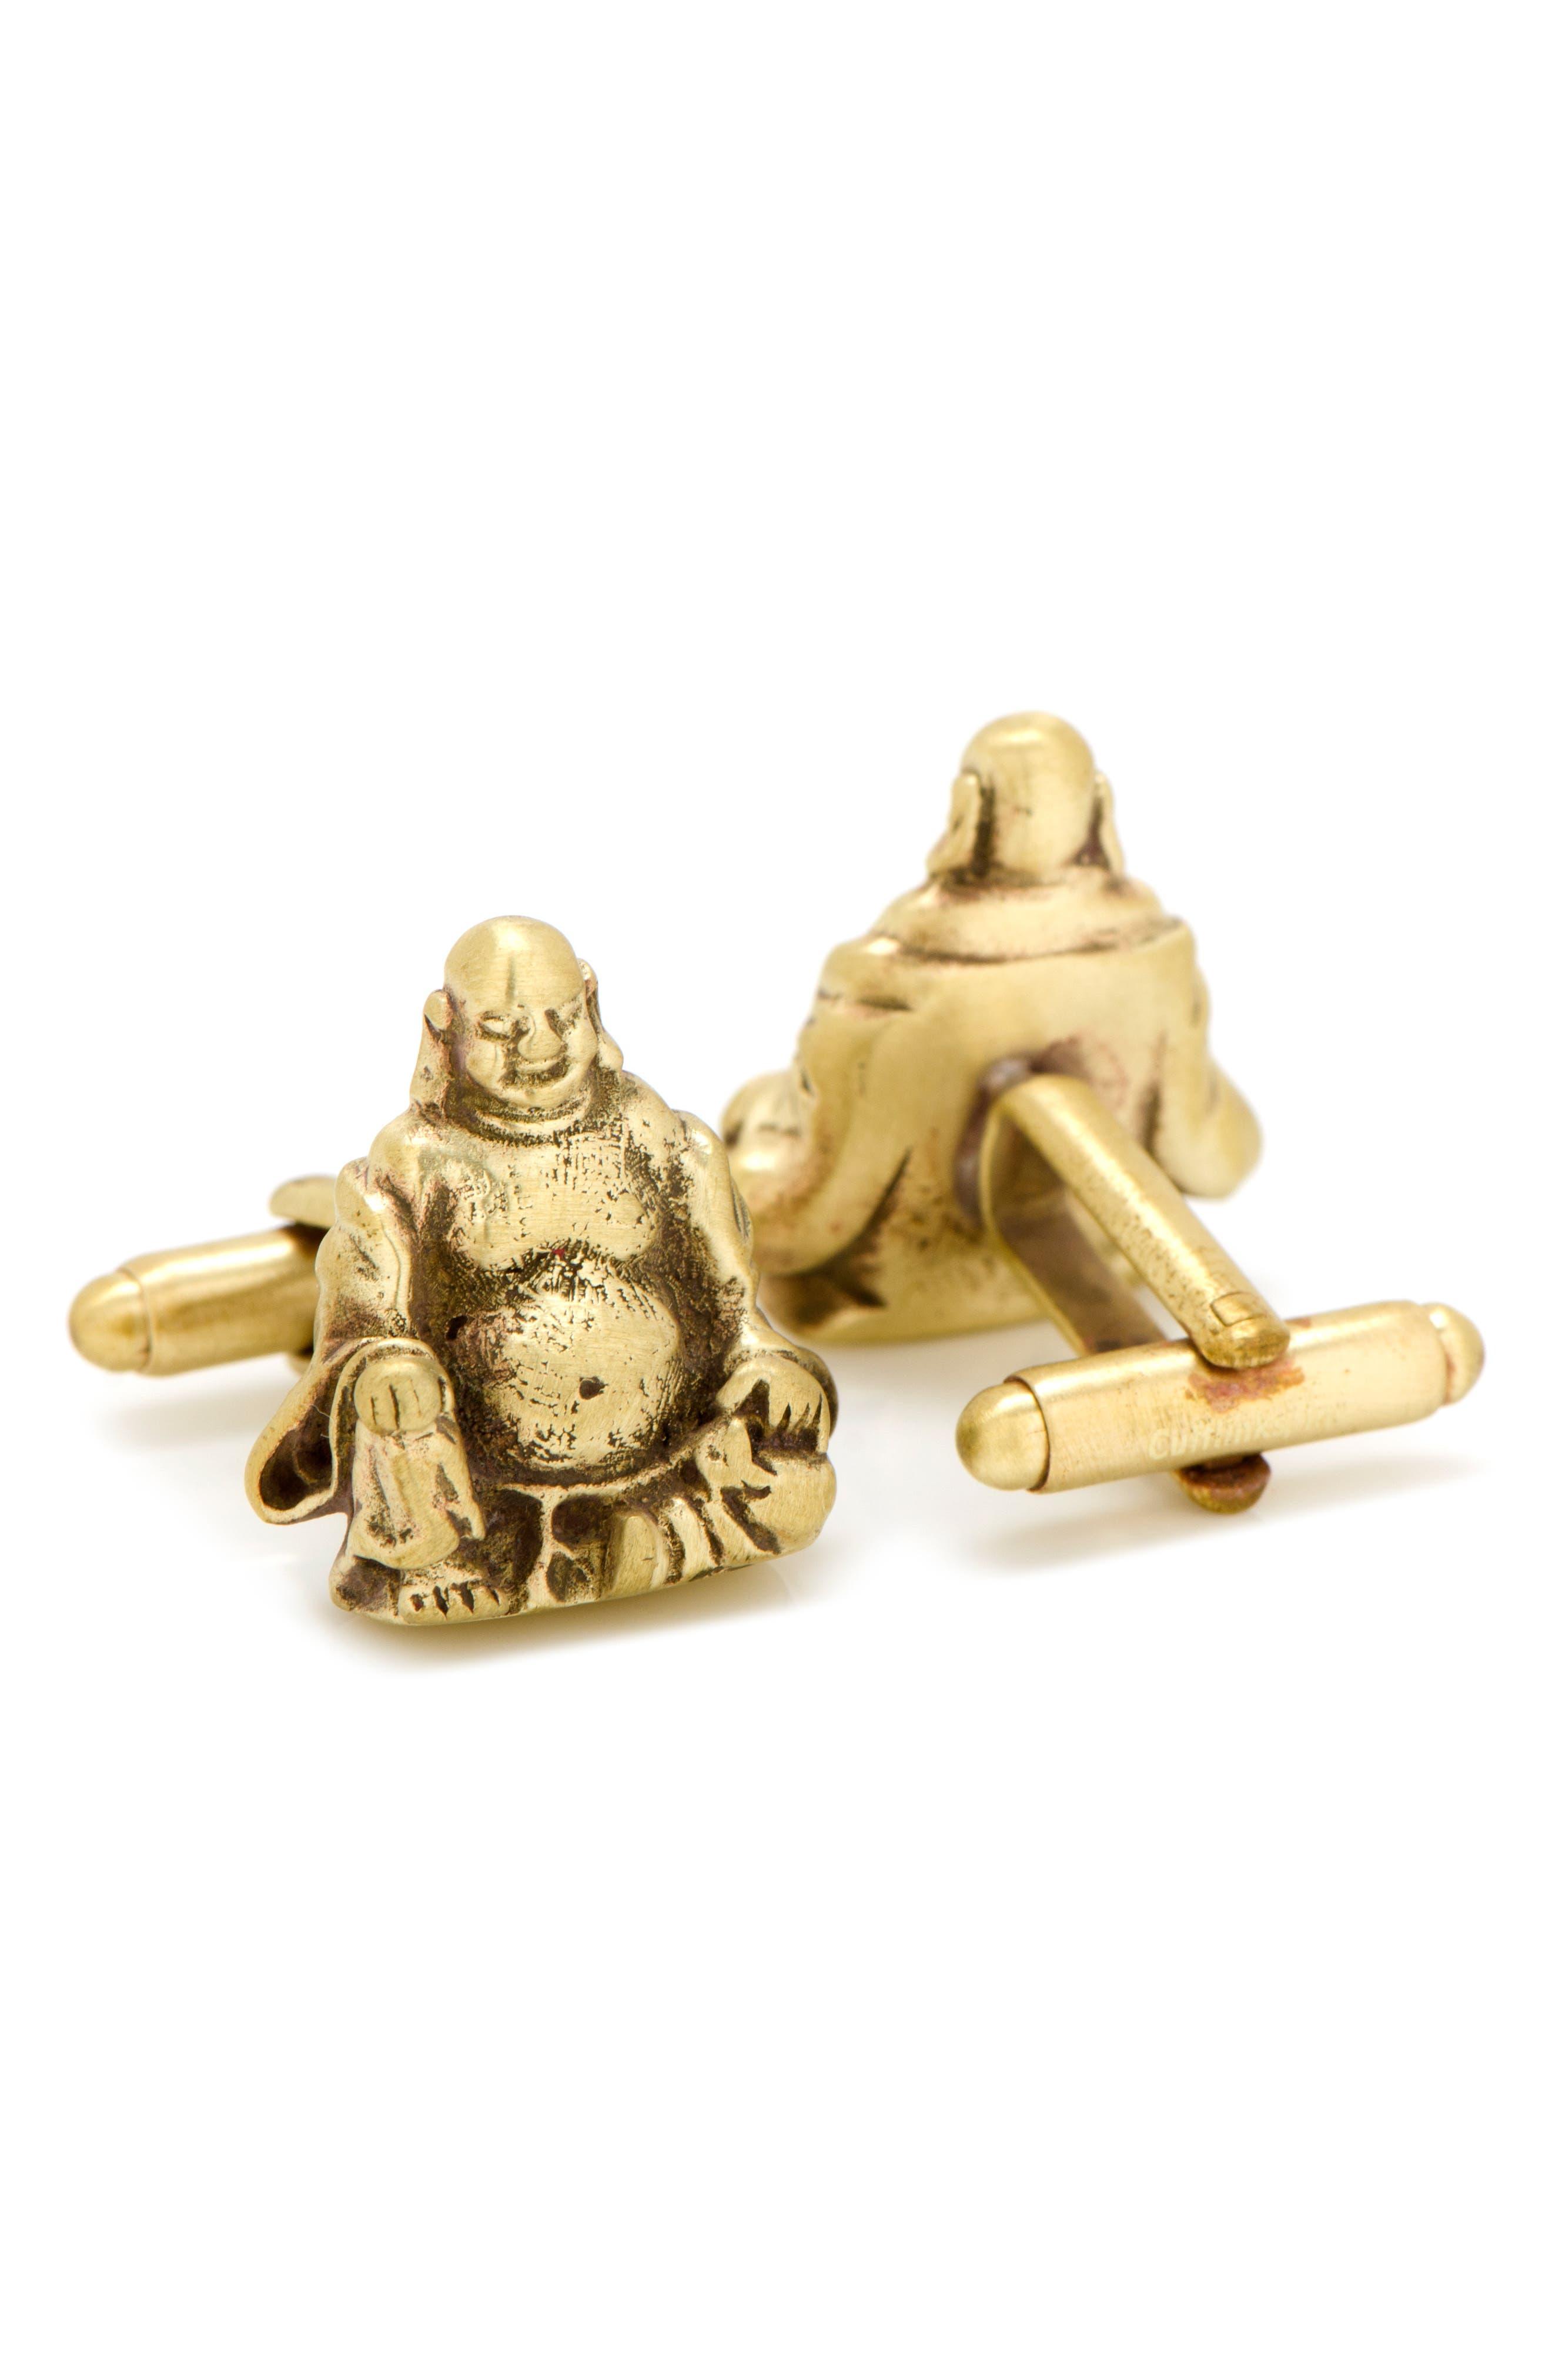 Smiling Buddha Cuff Links,                             Alternate thumbnail 2, color,                             METALLIC GOLD